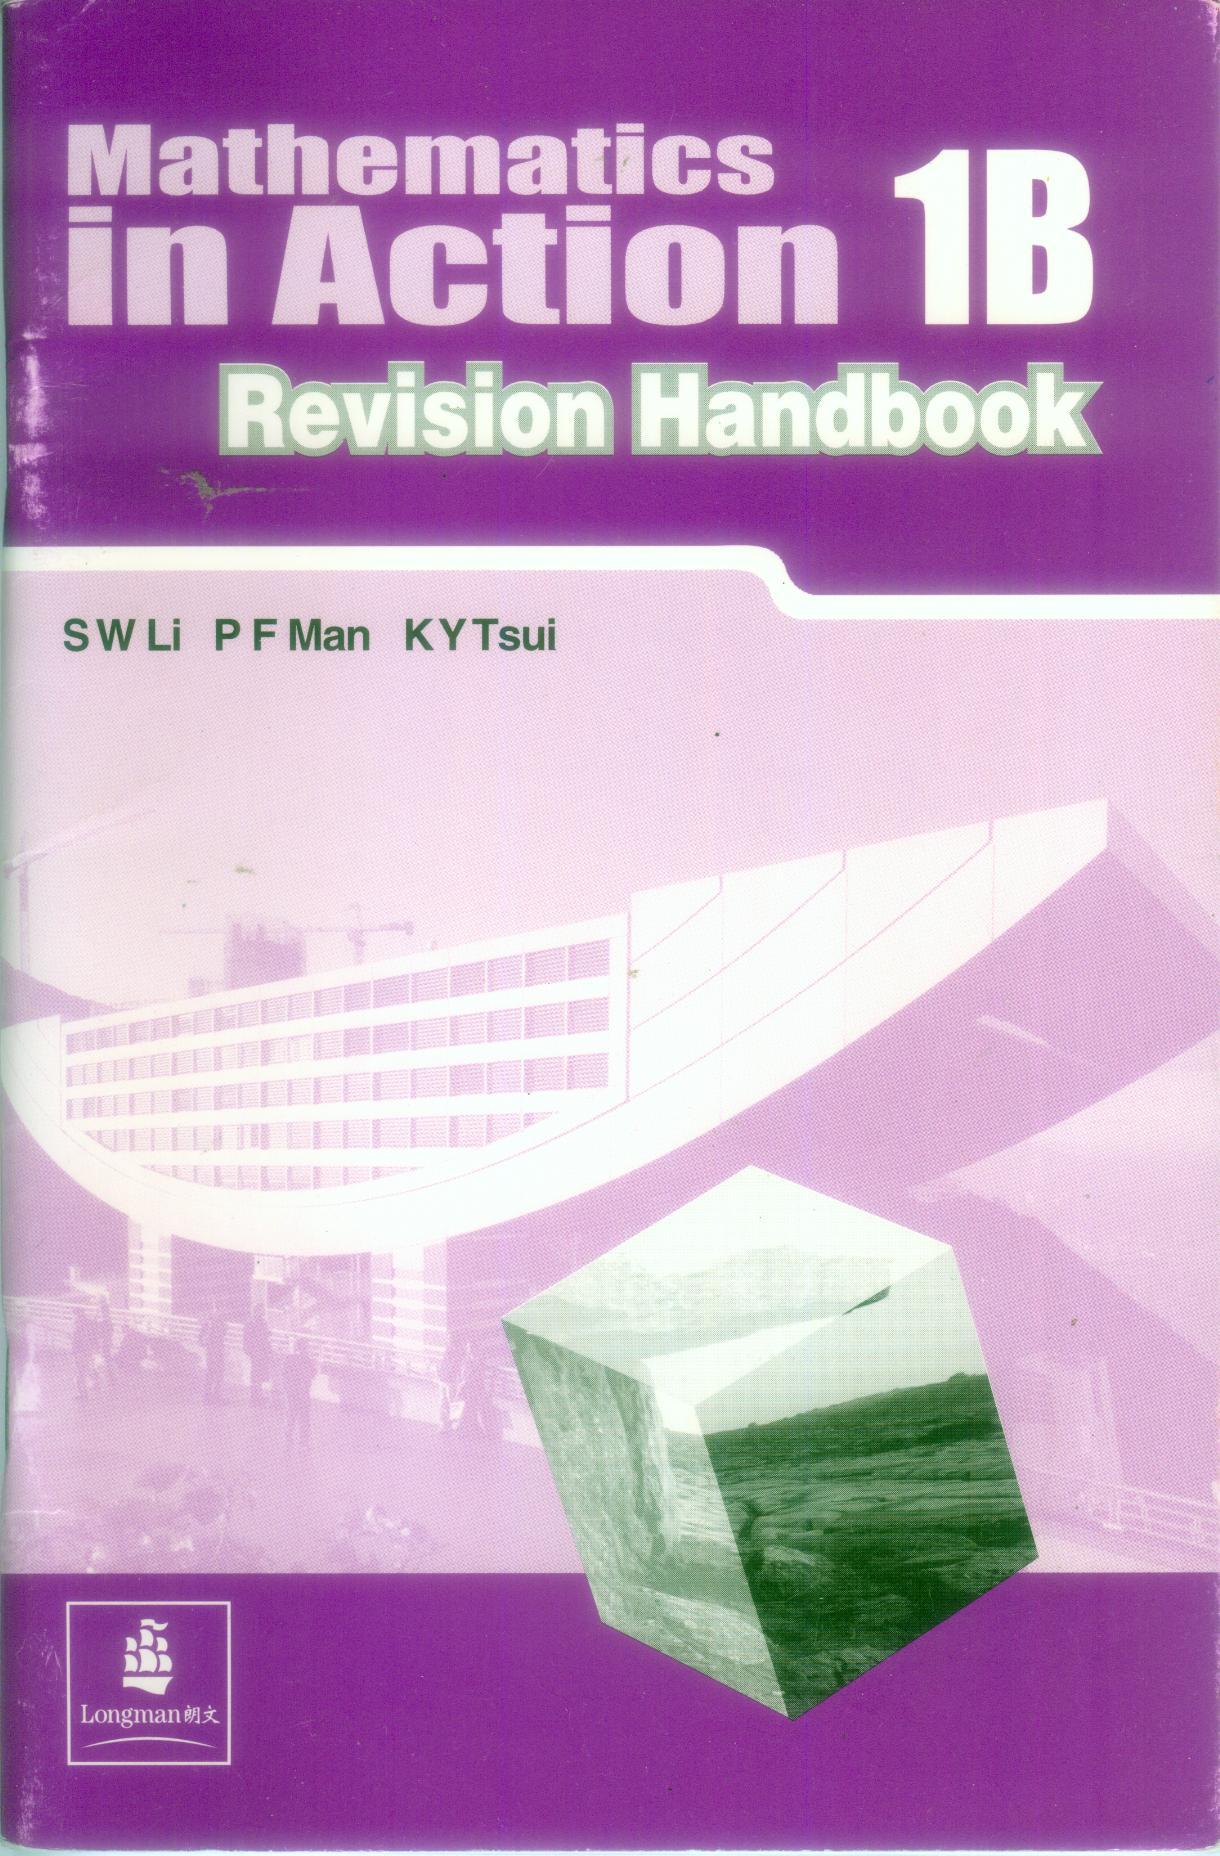 Mathematics in Action 1B Revision Handbook